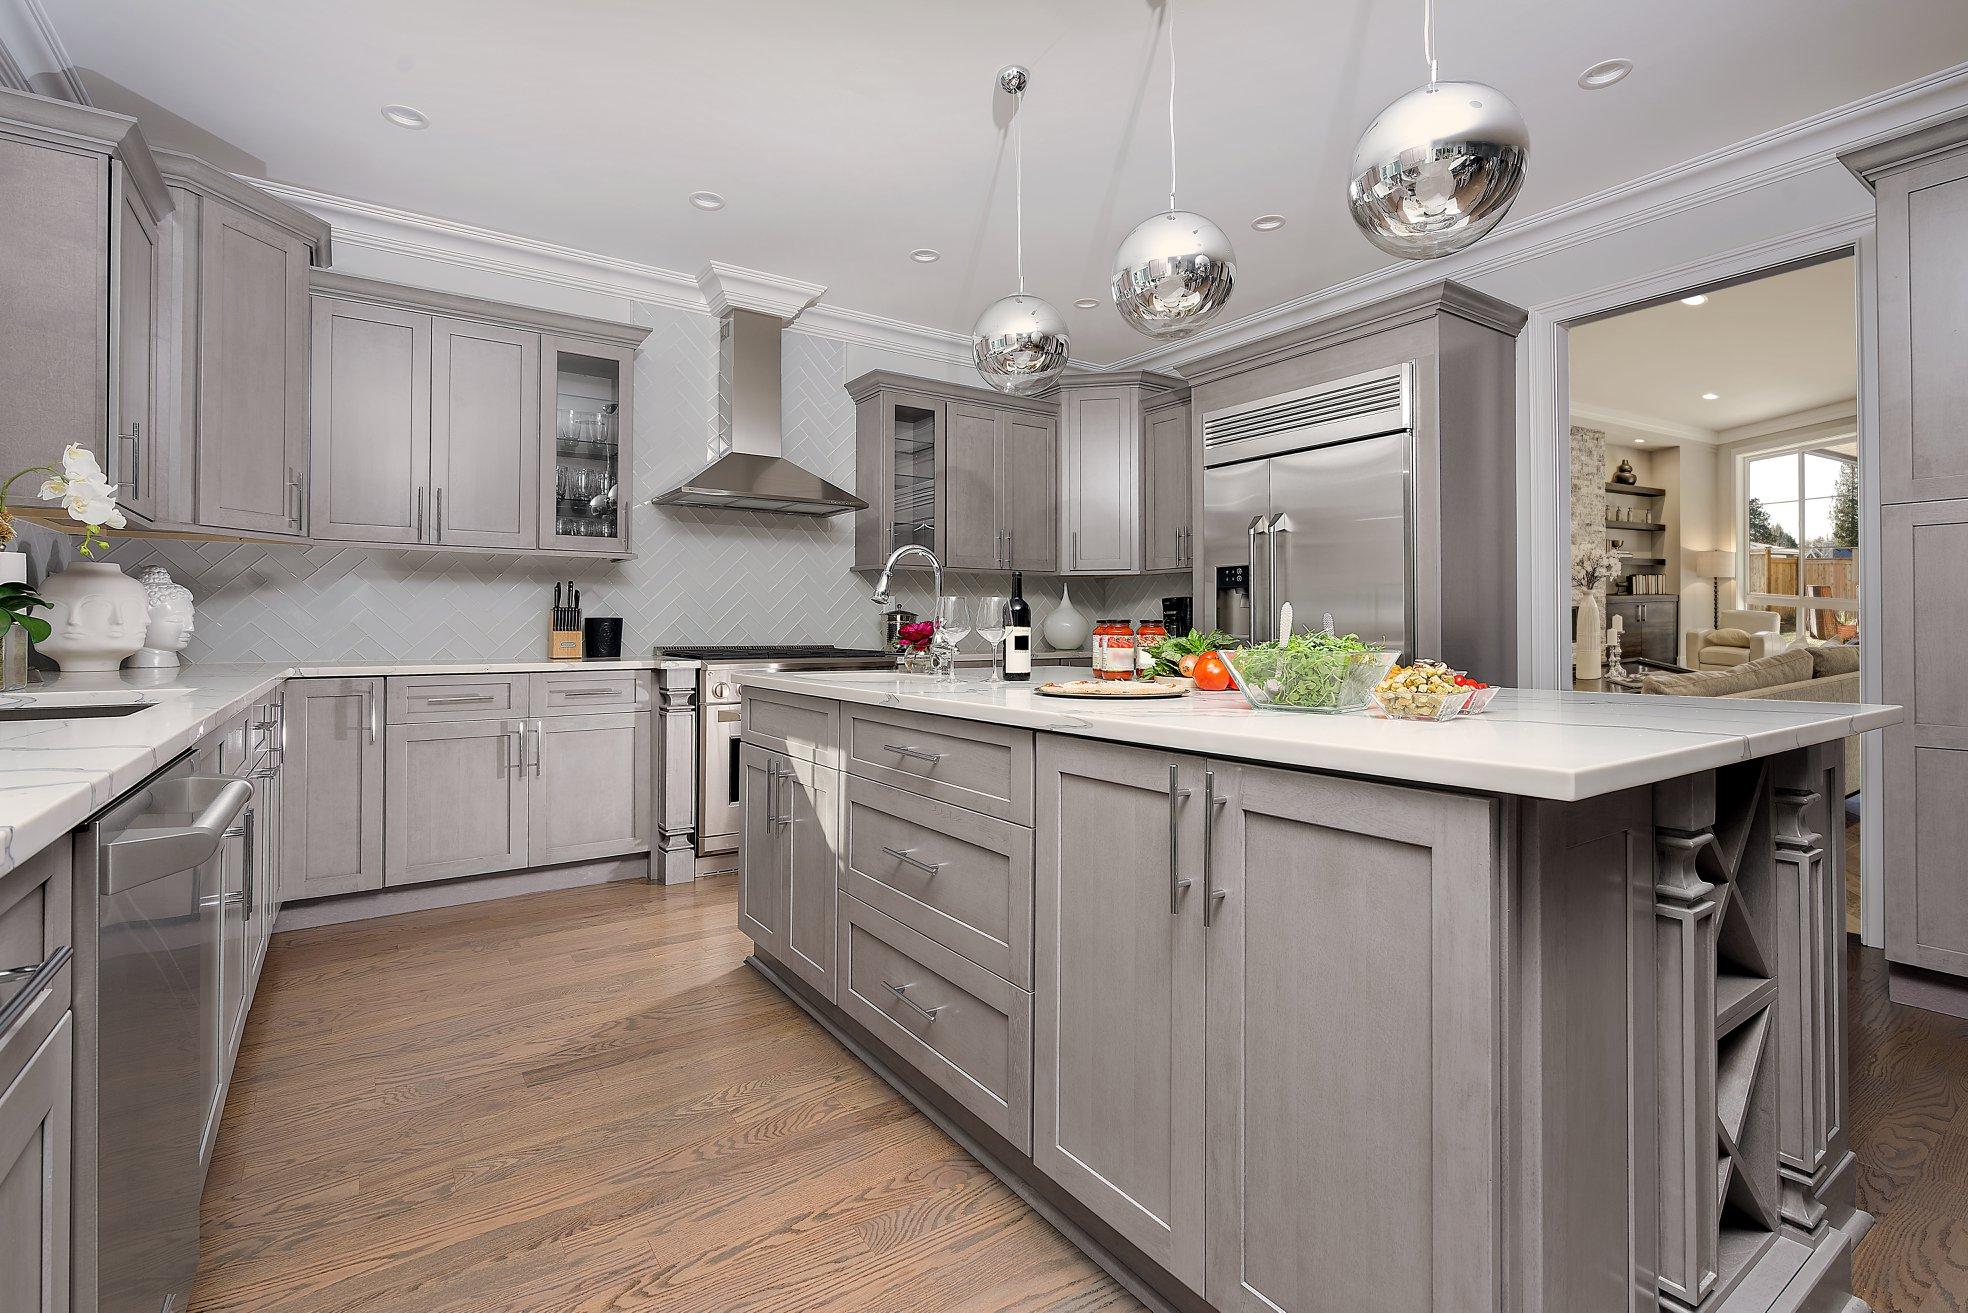 Kitchen Remodeling Contractors